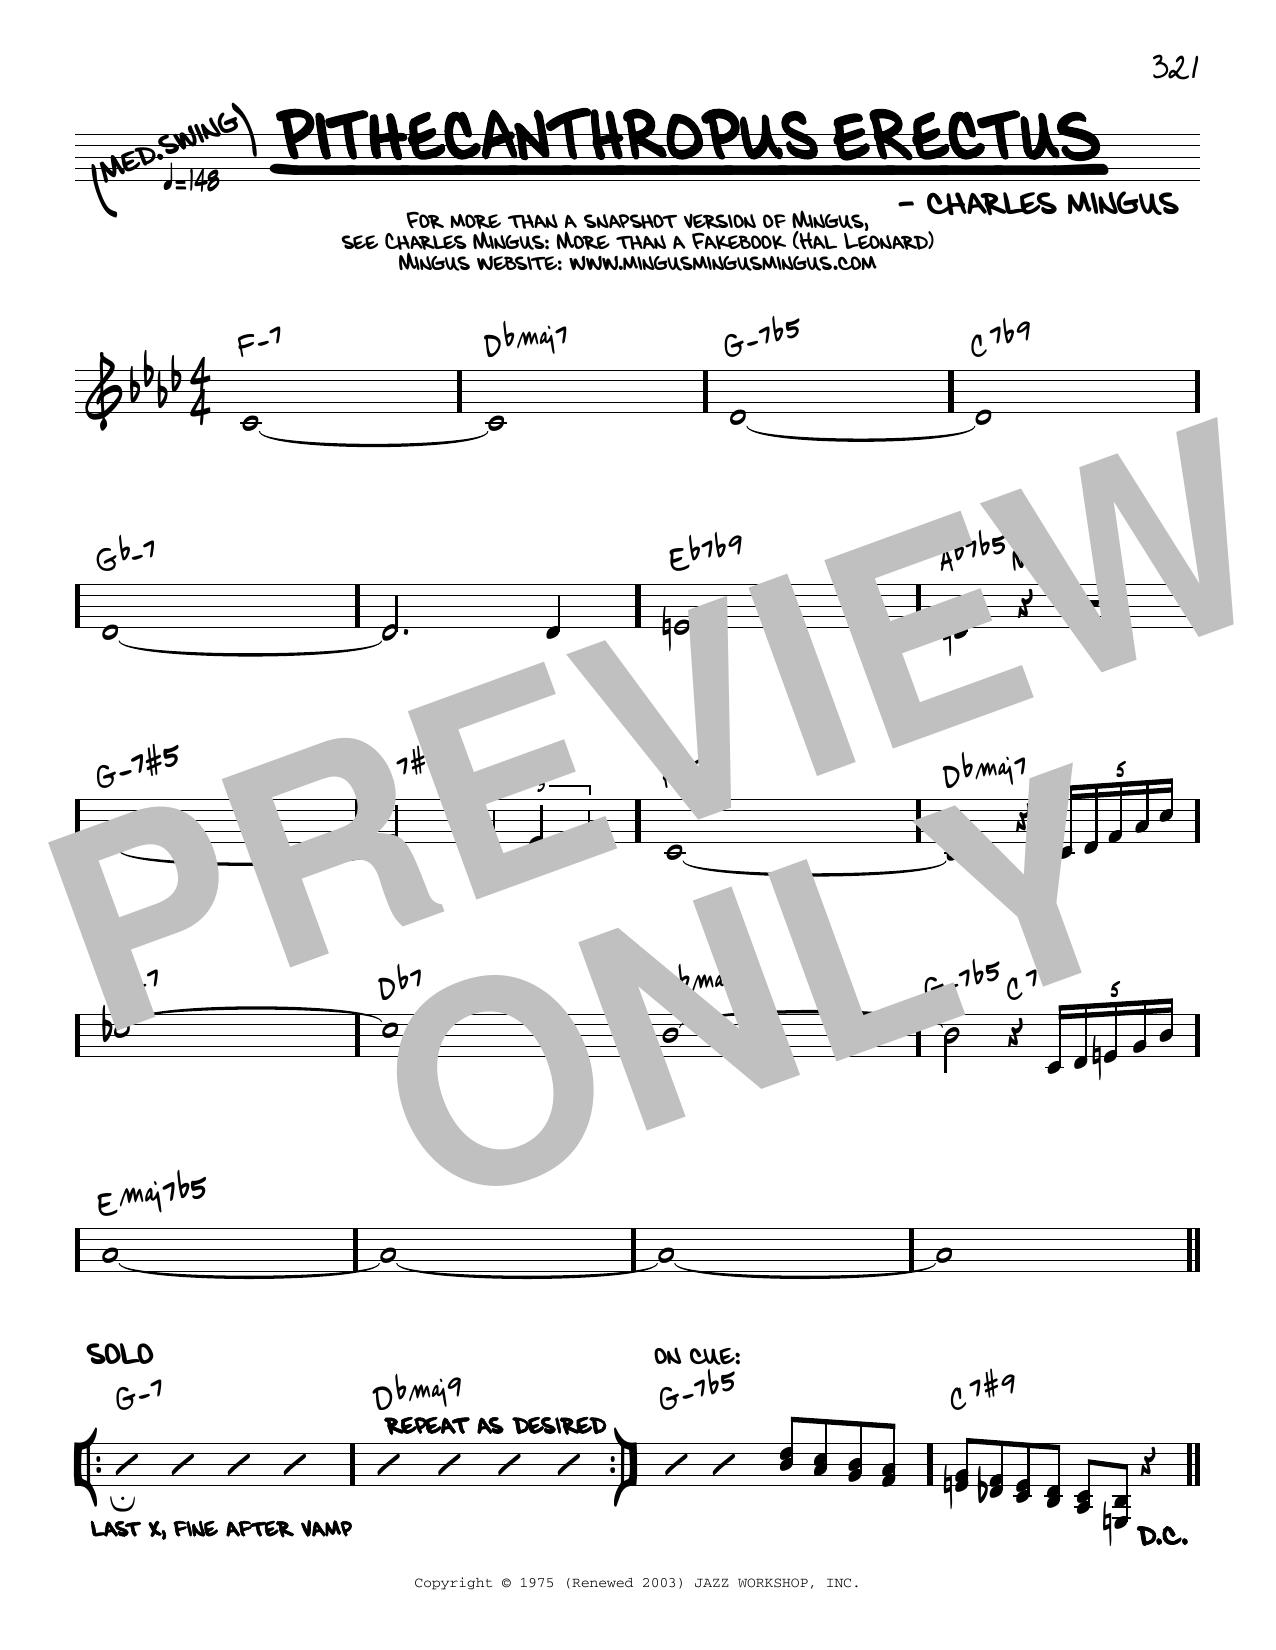 Charles Mingus Pithecanthropus Erectus [Reharmonized version] (arr. Jack Grassel) sheet music notes printable PDF score